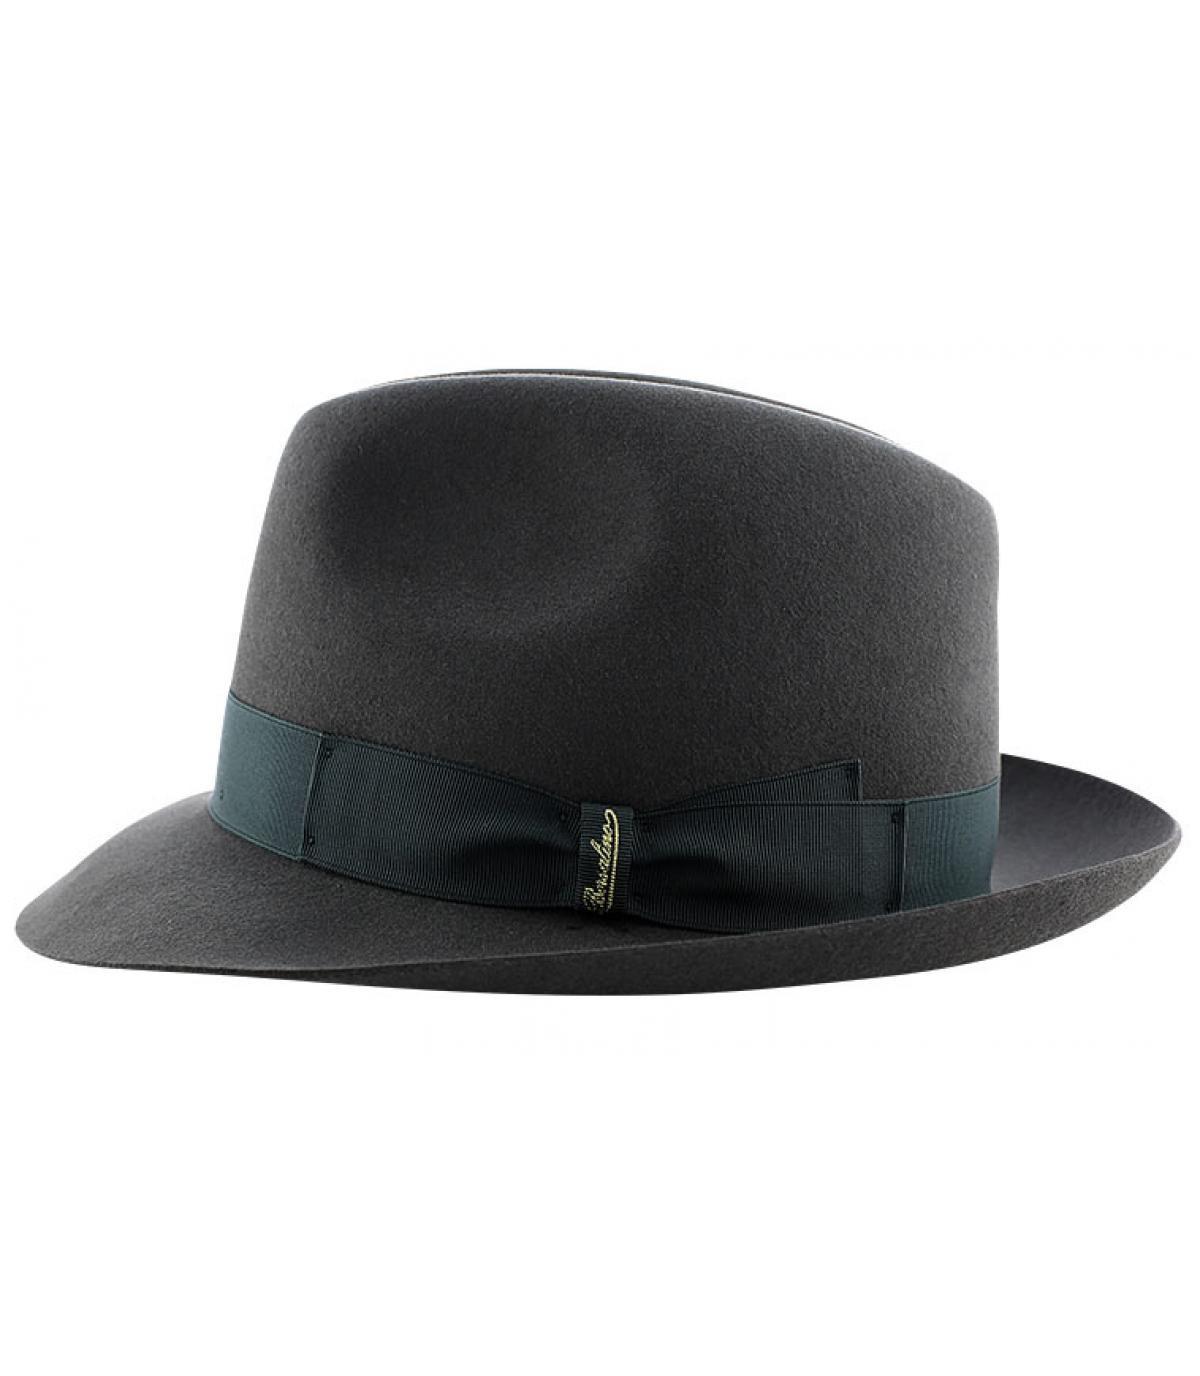 Details Marengo grey fur felt hat - afbeeling 4